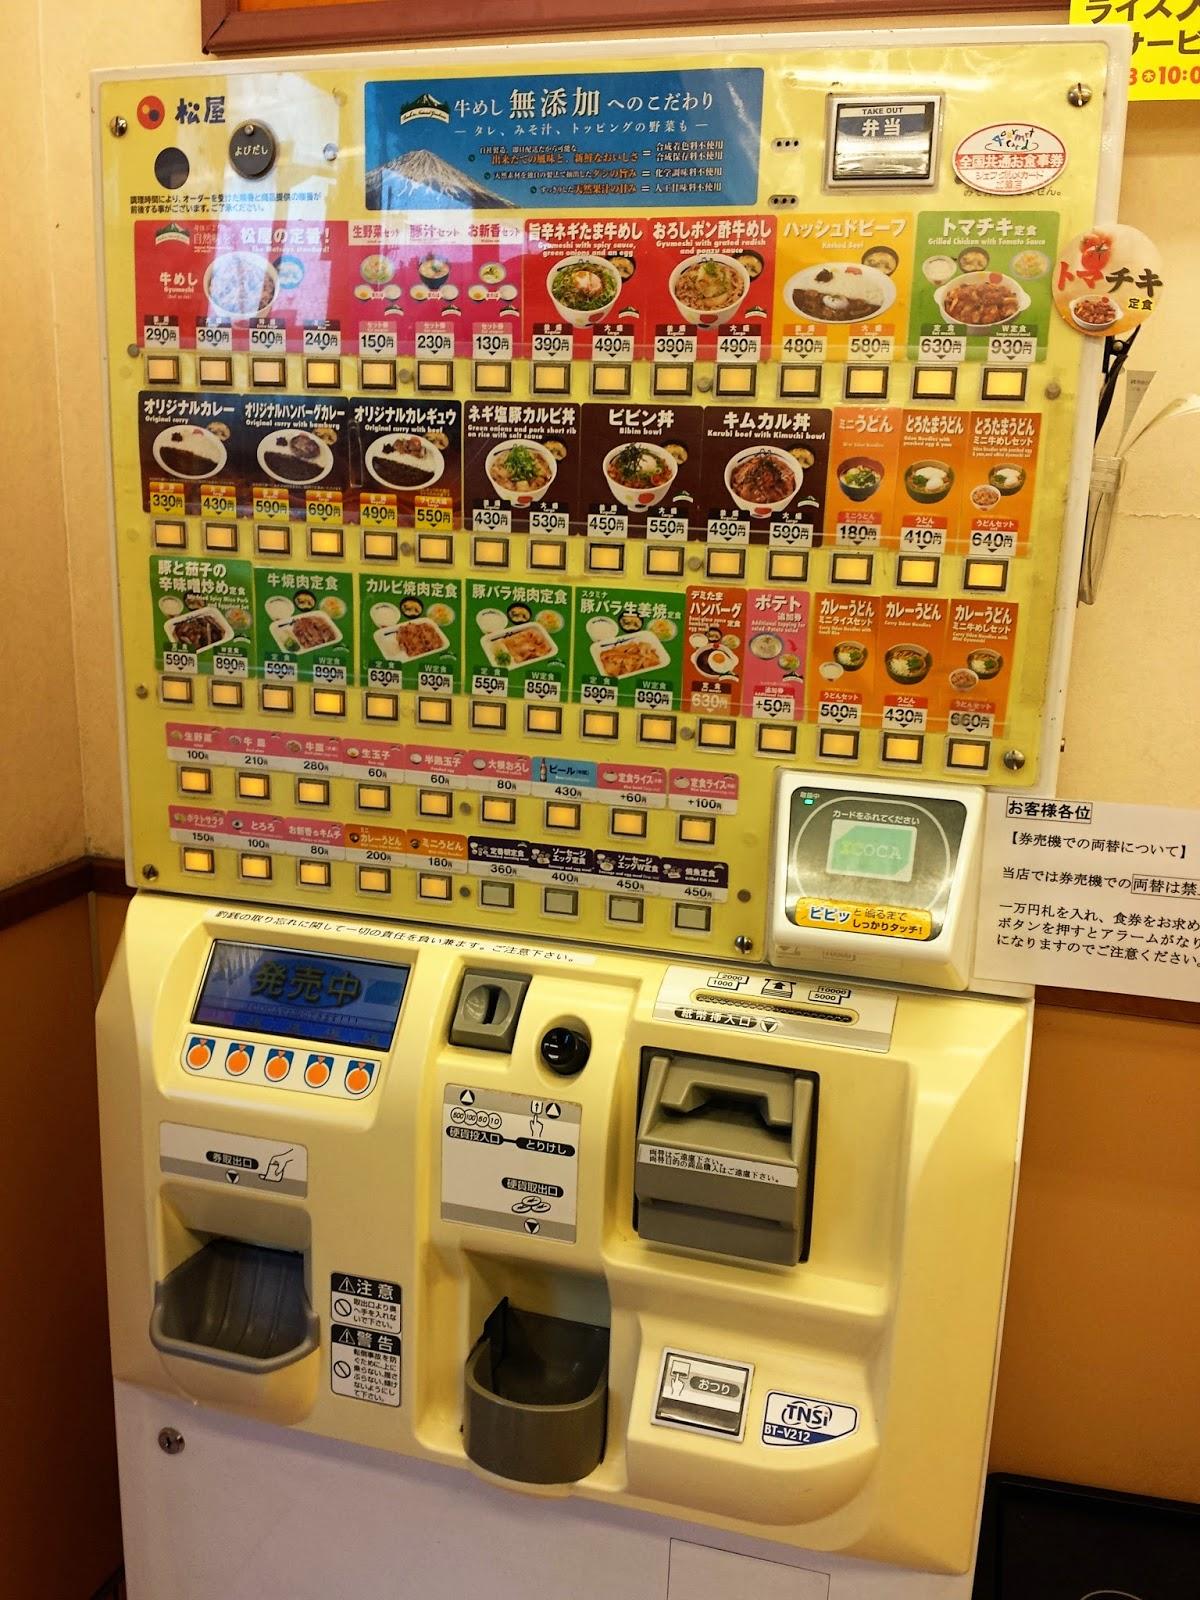 japan coffee vending machine